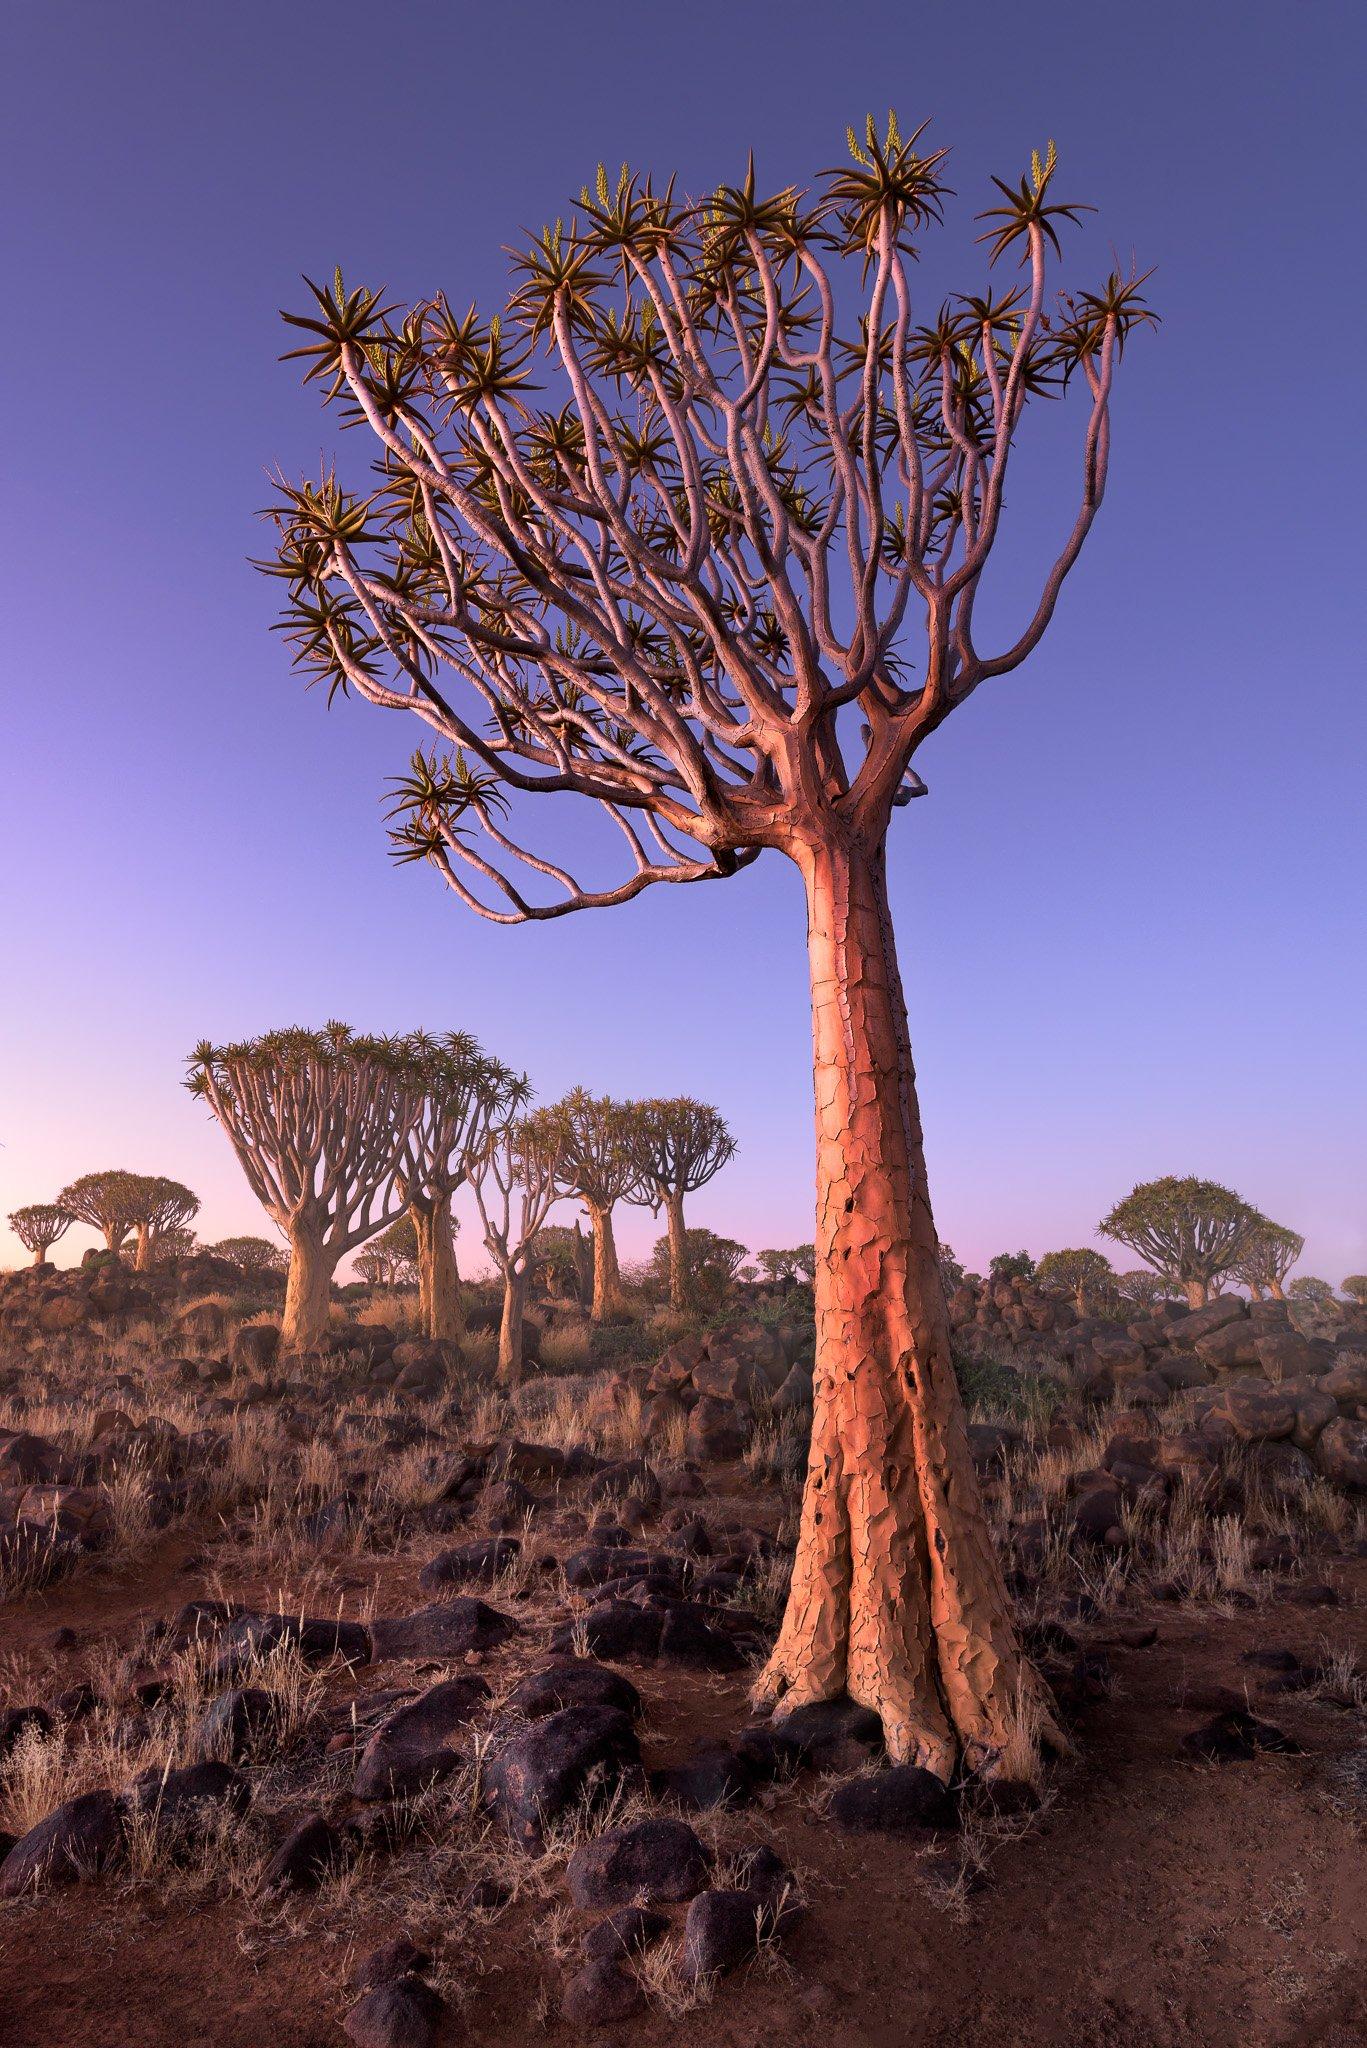 Africa, african, aloe, arid, bark, black, blue, branches, bush, dawn, desert, dichotoma, dry, forest, giant, granite, grass, green, keetmanshoop, landscape, light, magical, morning, mystical, namib, namibia, national, natural, nature, outdoor, park, plant, anshar